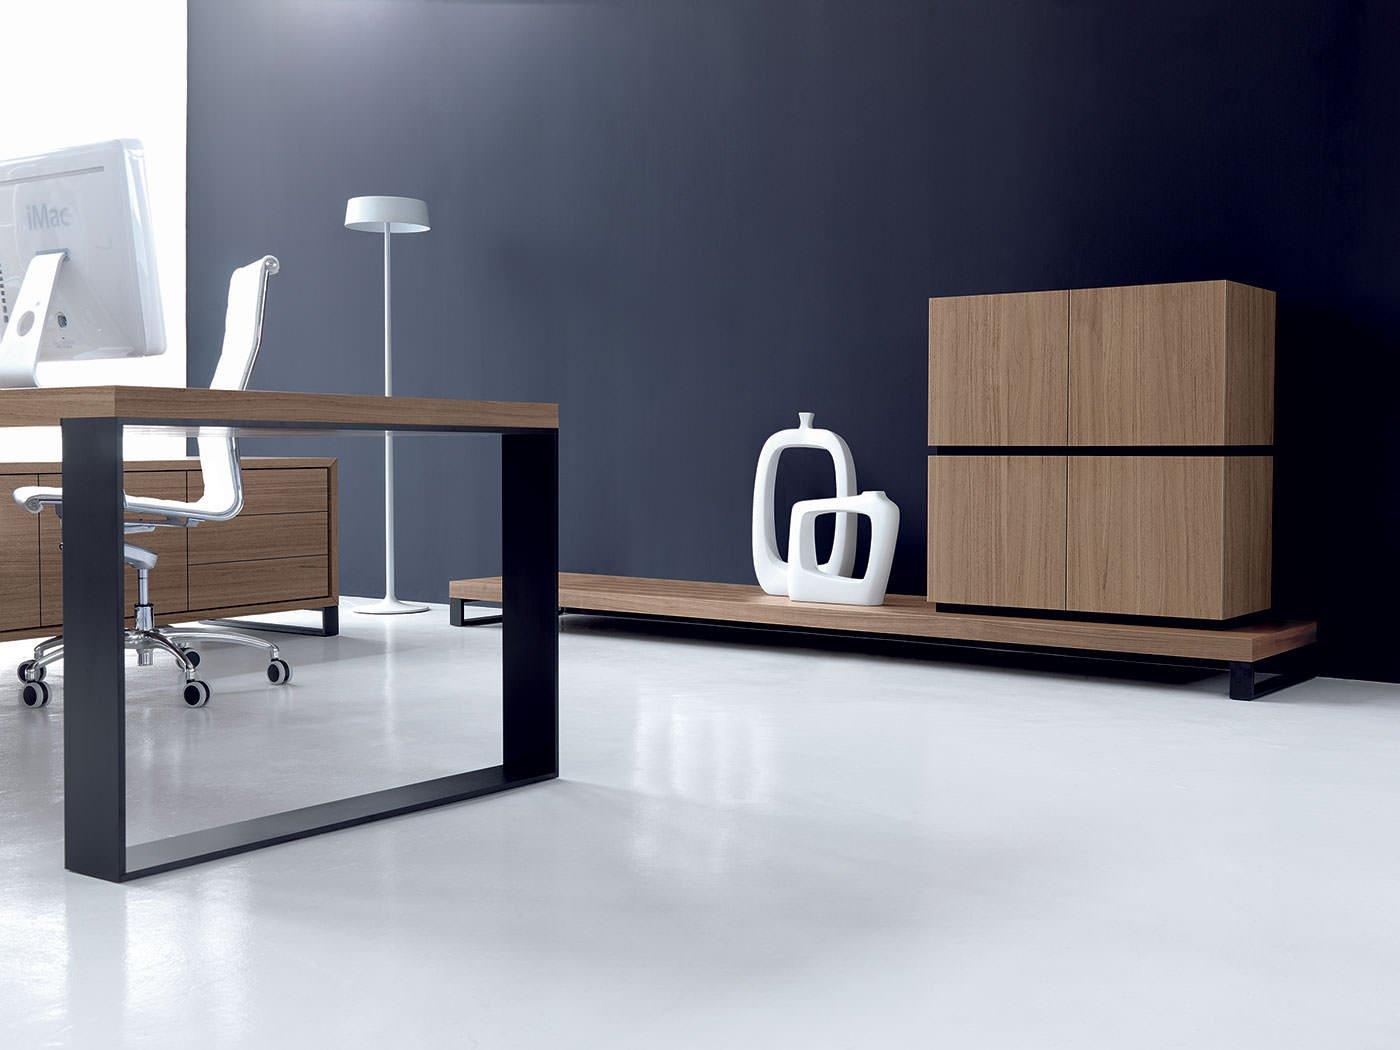 Loop mobili uffici presidenziali arredamento uffici for Armadi per uffici